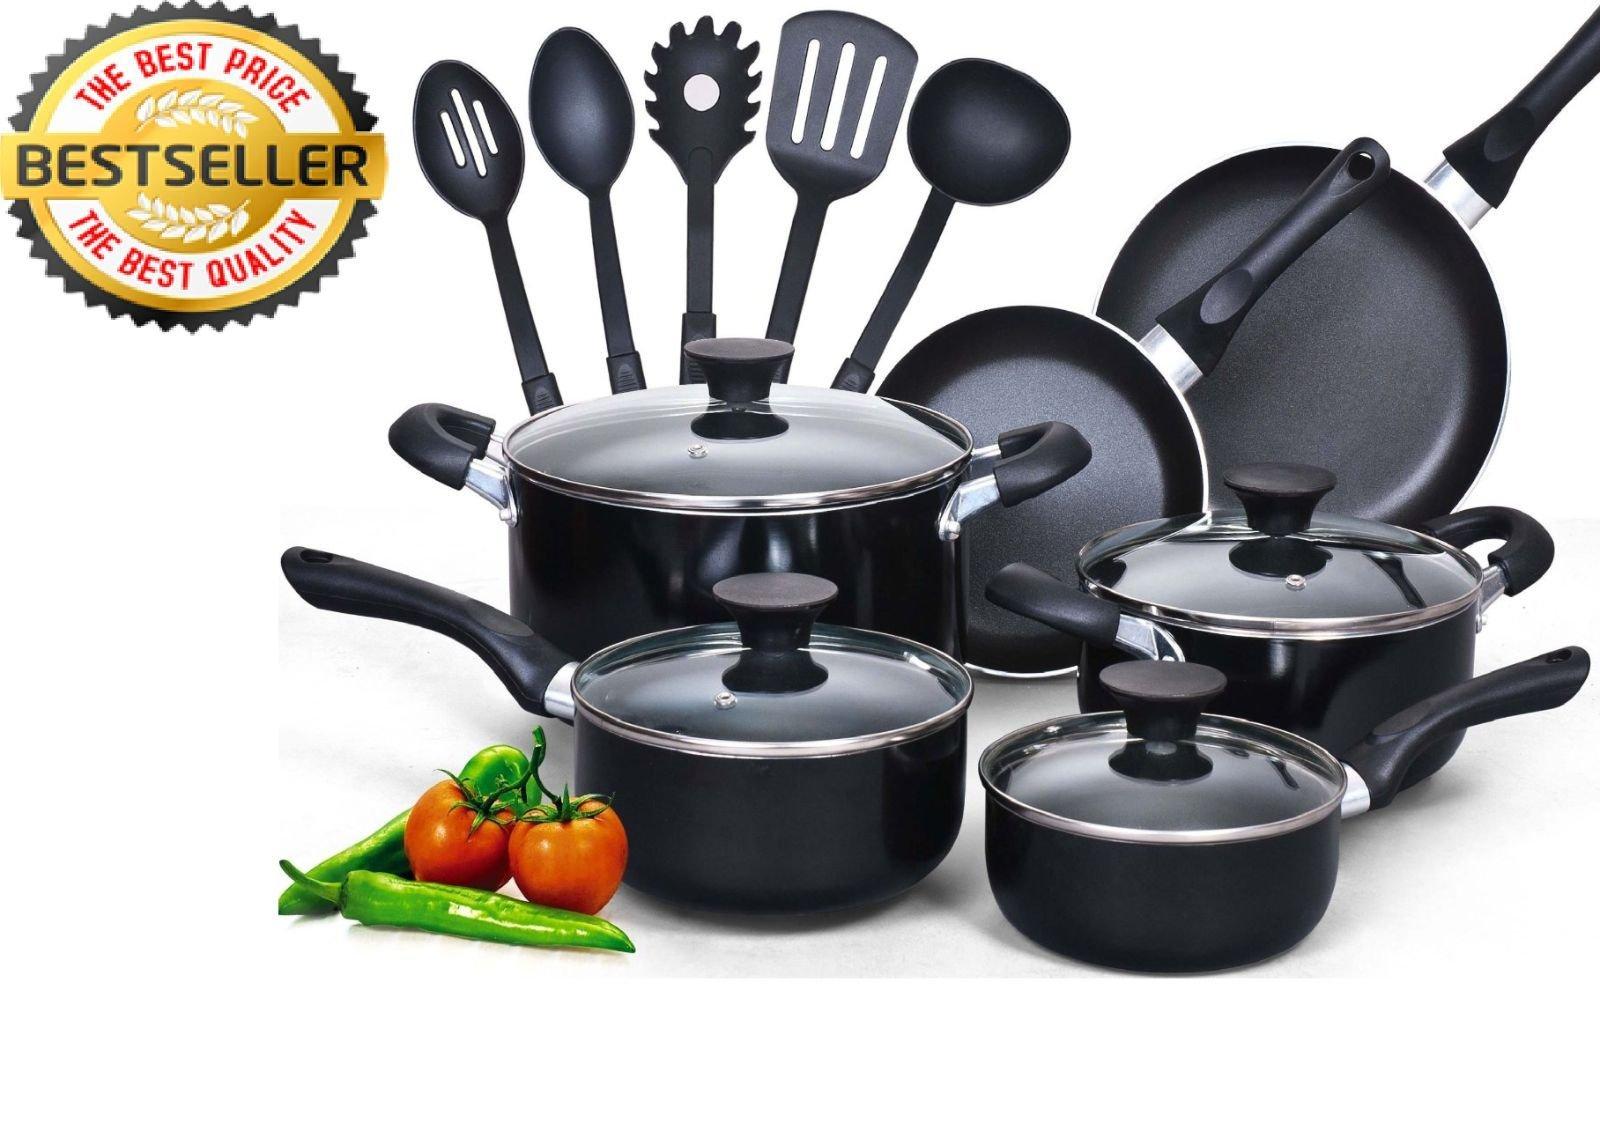 New! Cook N Home 15 Piece Non Stick Black Soft Handle Cookware Set Kitchen